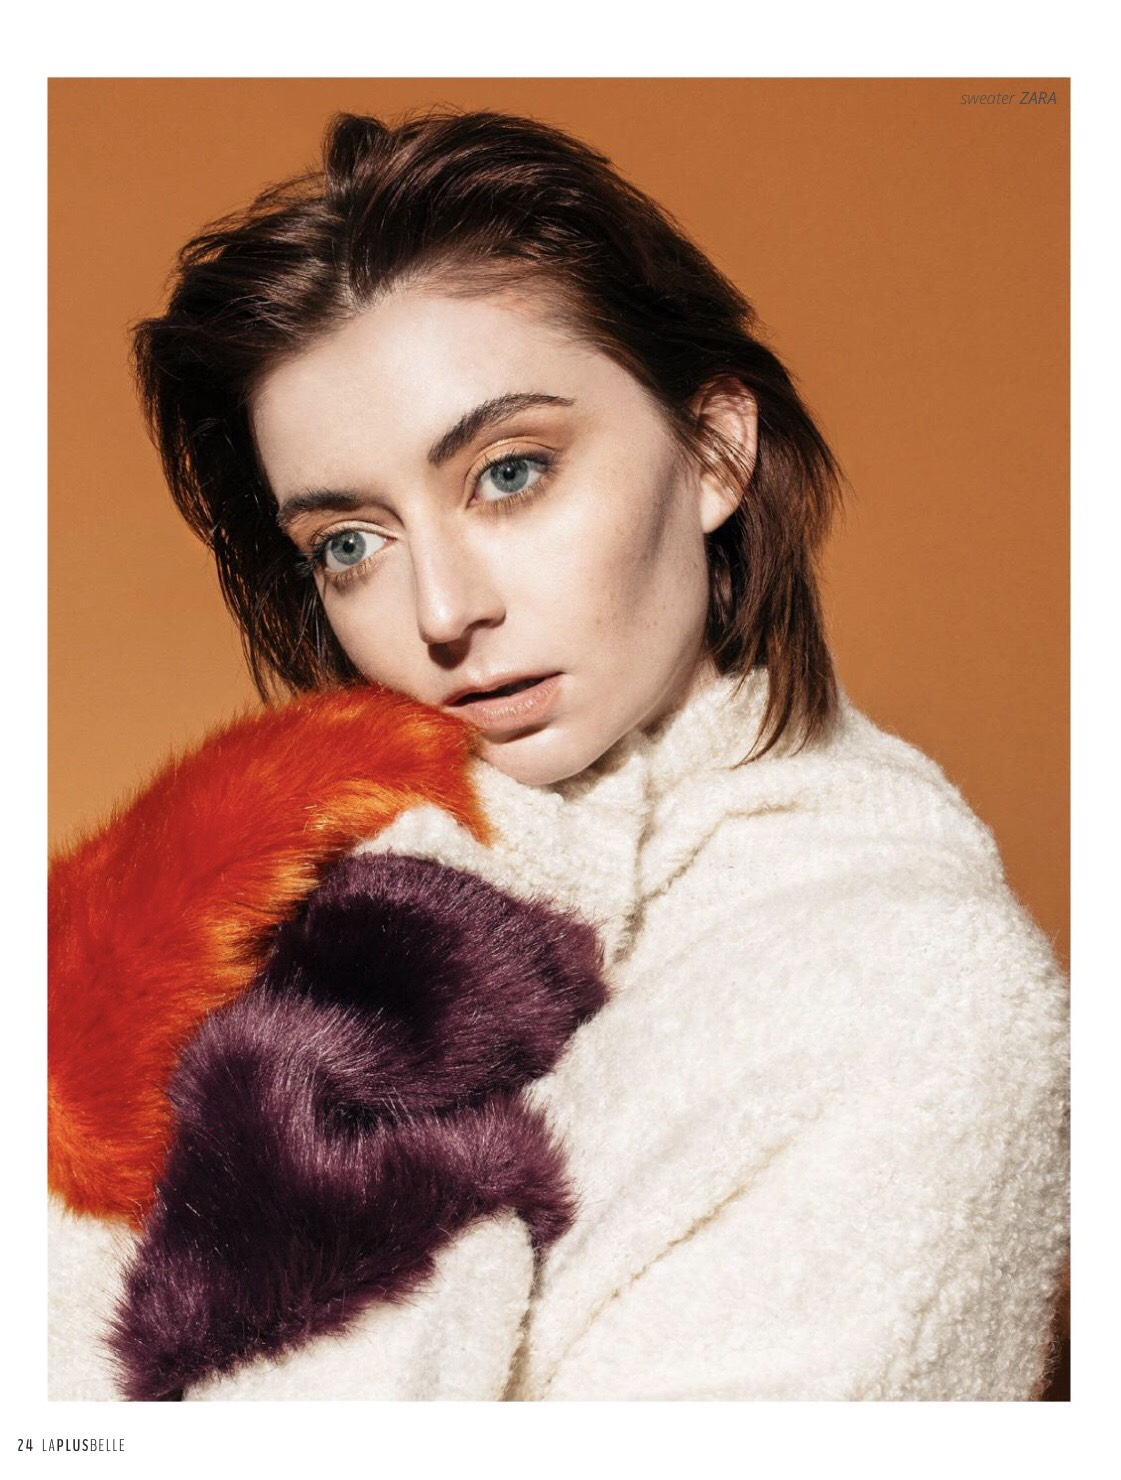 nectarine dream//la plus belle magazine - / photographer : alicia stepp / model : nina burns/ hmua : briana dai